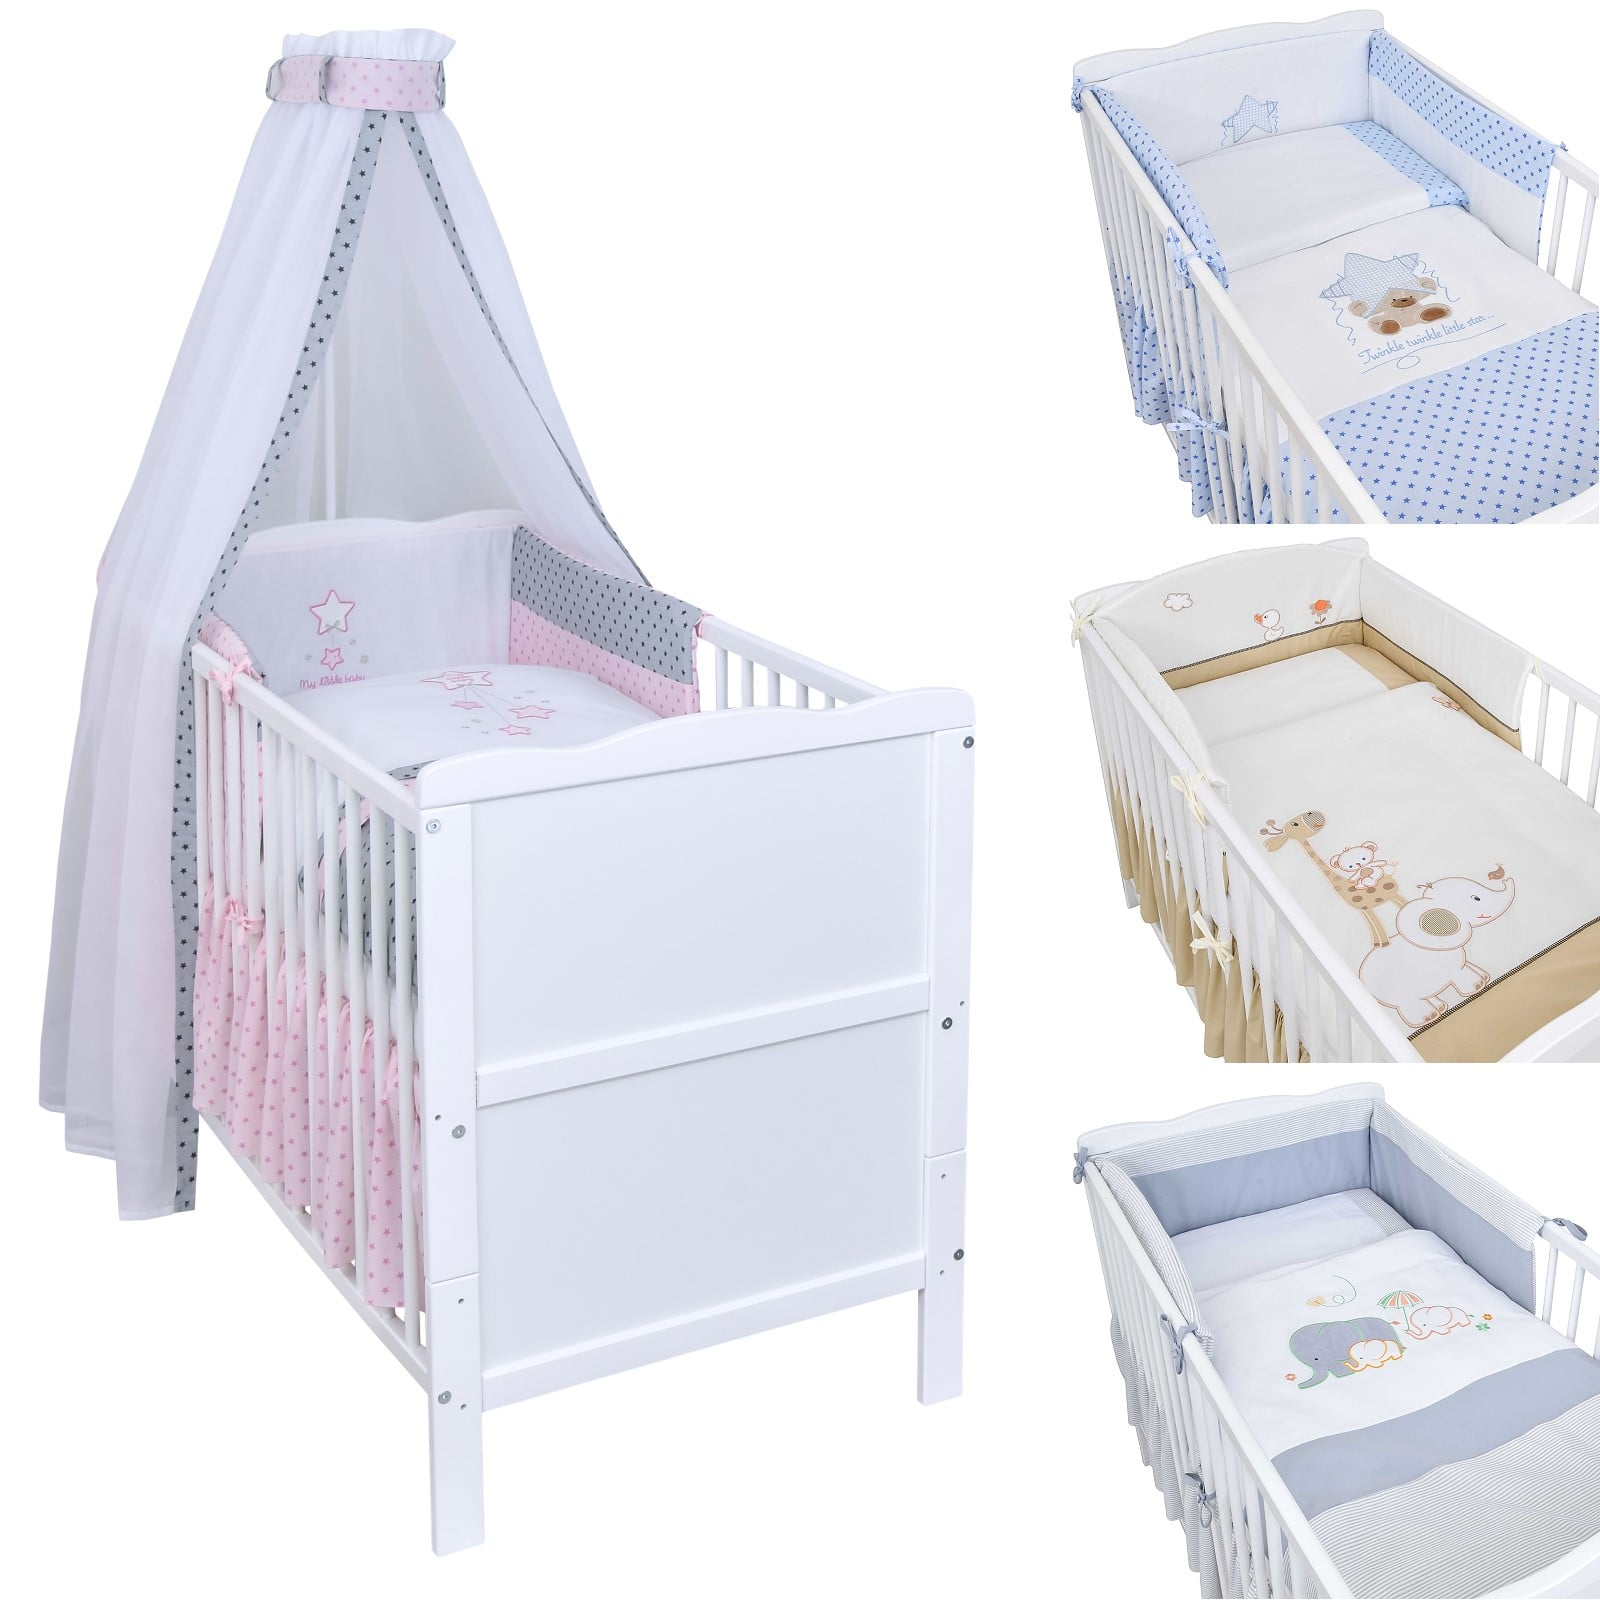 For-Your-Little-Kinderbett wasserdicht Spannbettlaken 120/x 60/cm 2/St/ück